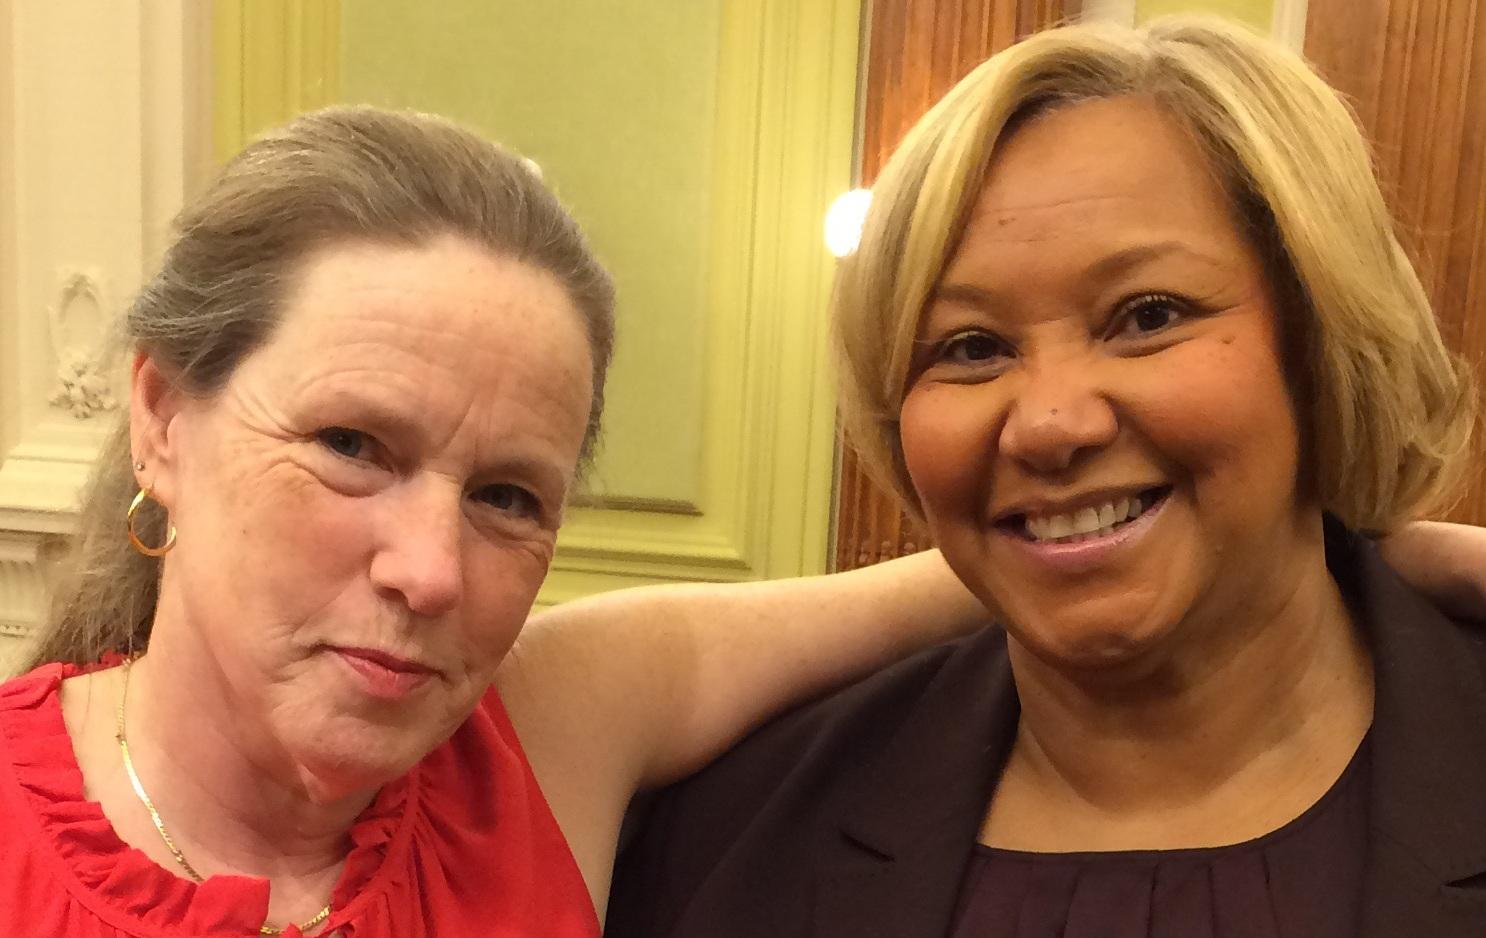 Margaret Dore and District of Columbia Councilmember Yvette Alexander